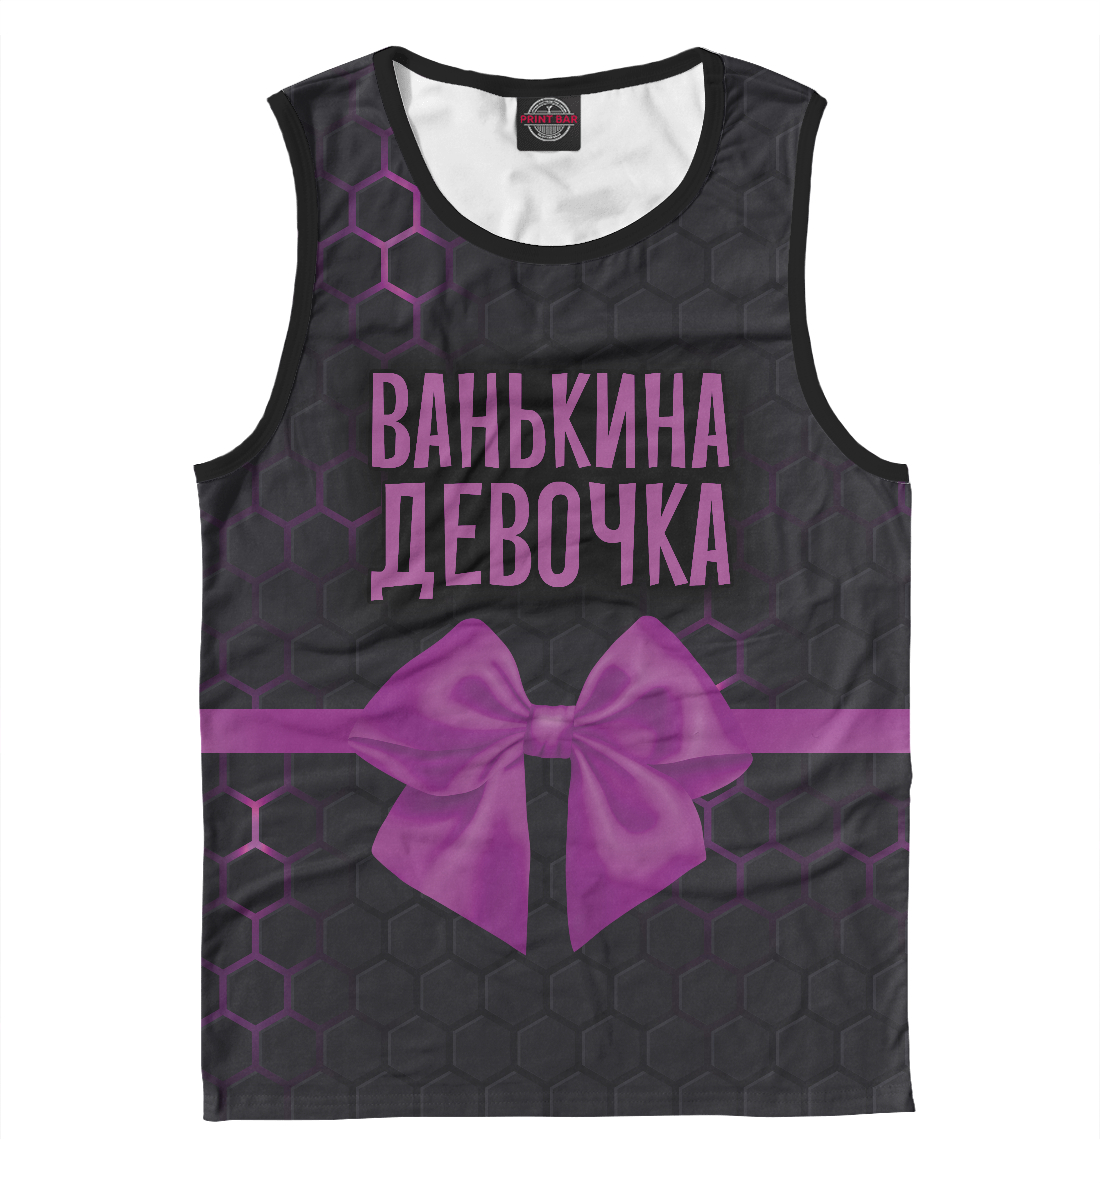 Майка Ванькина девочка (351264)